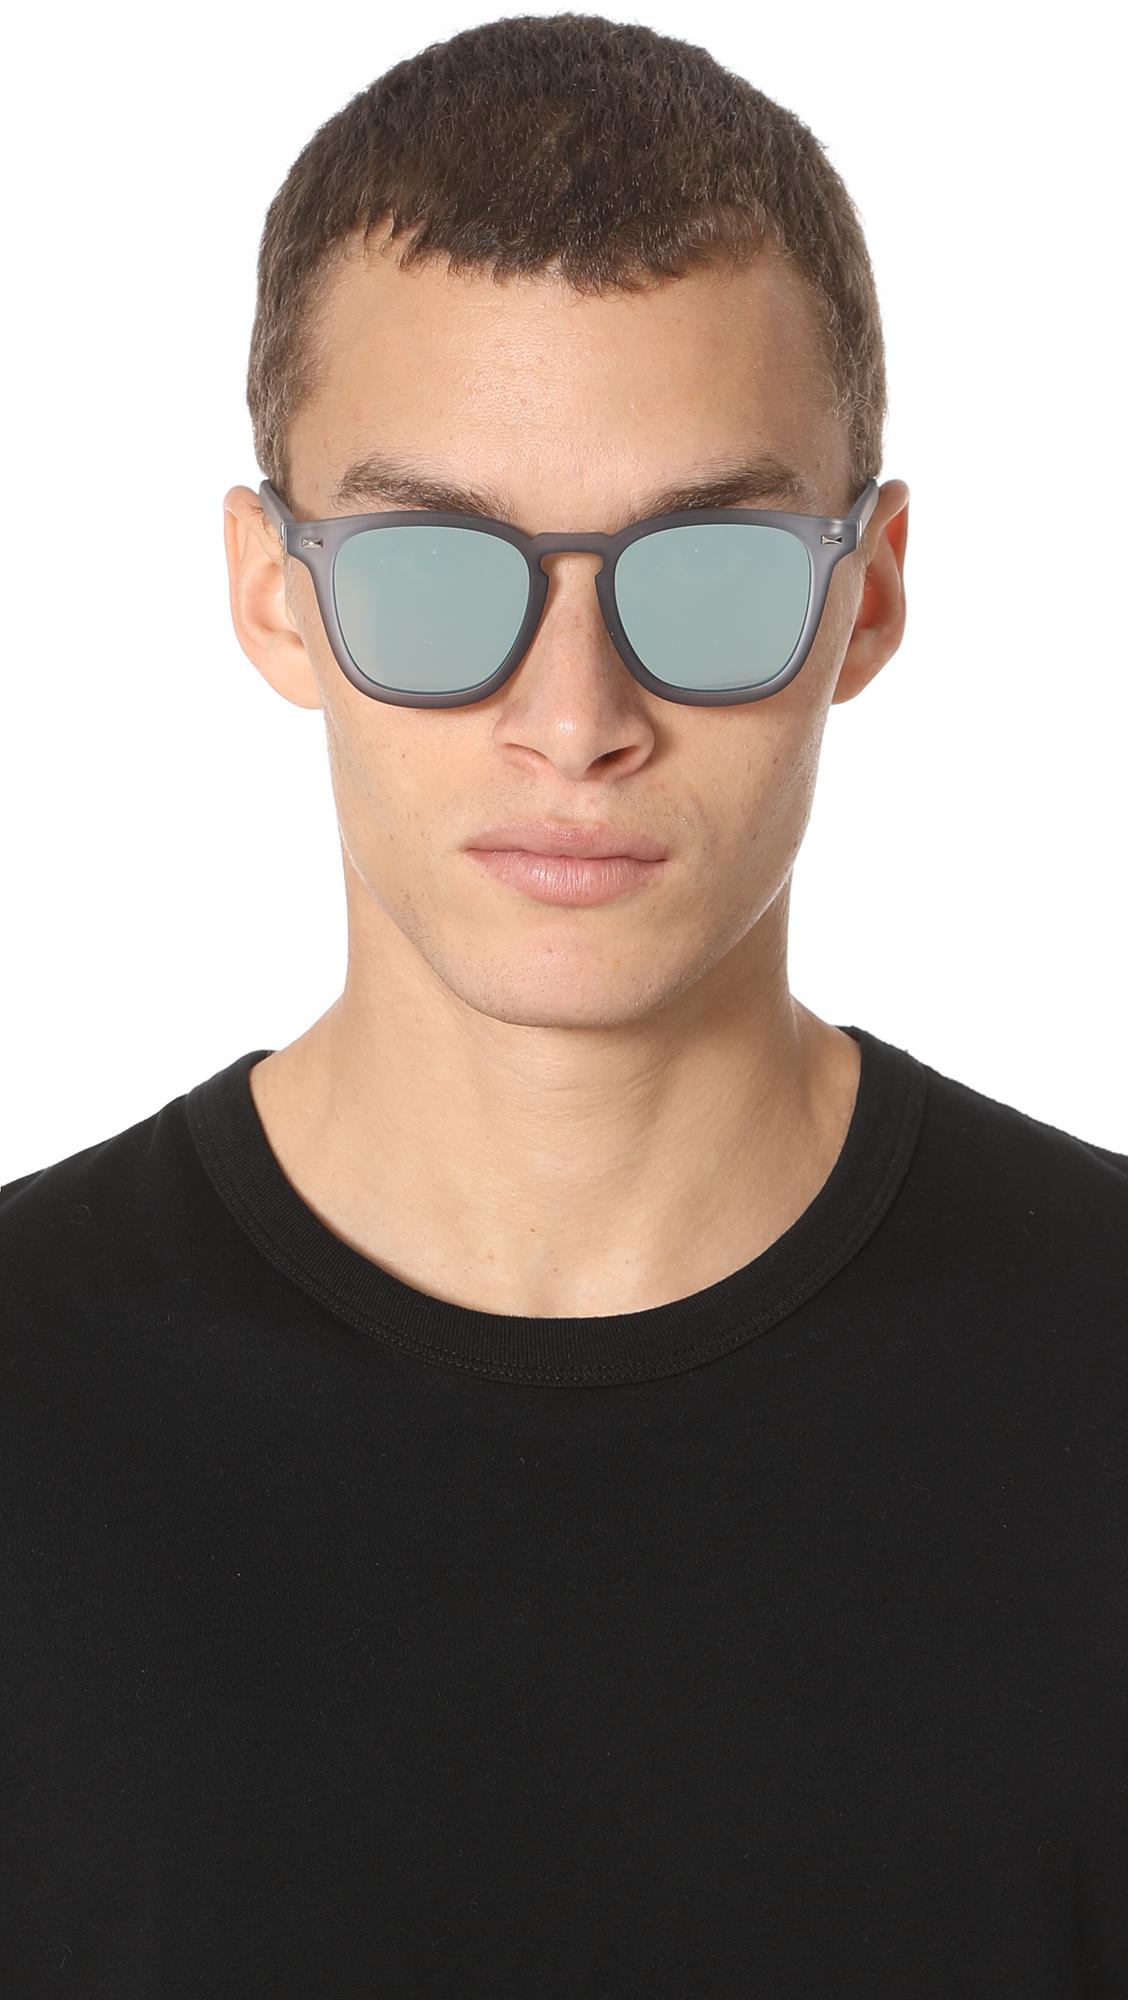 Le Specs No Biggie-Blau I9ksazzy